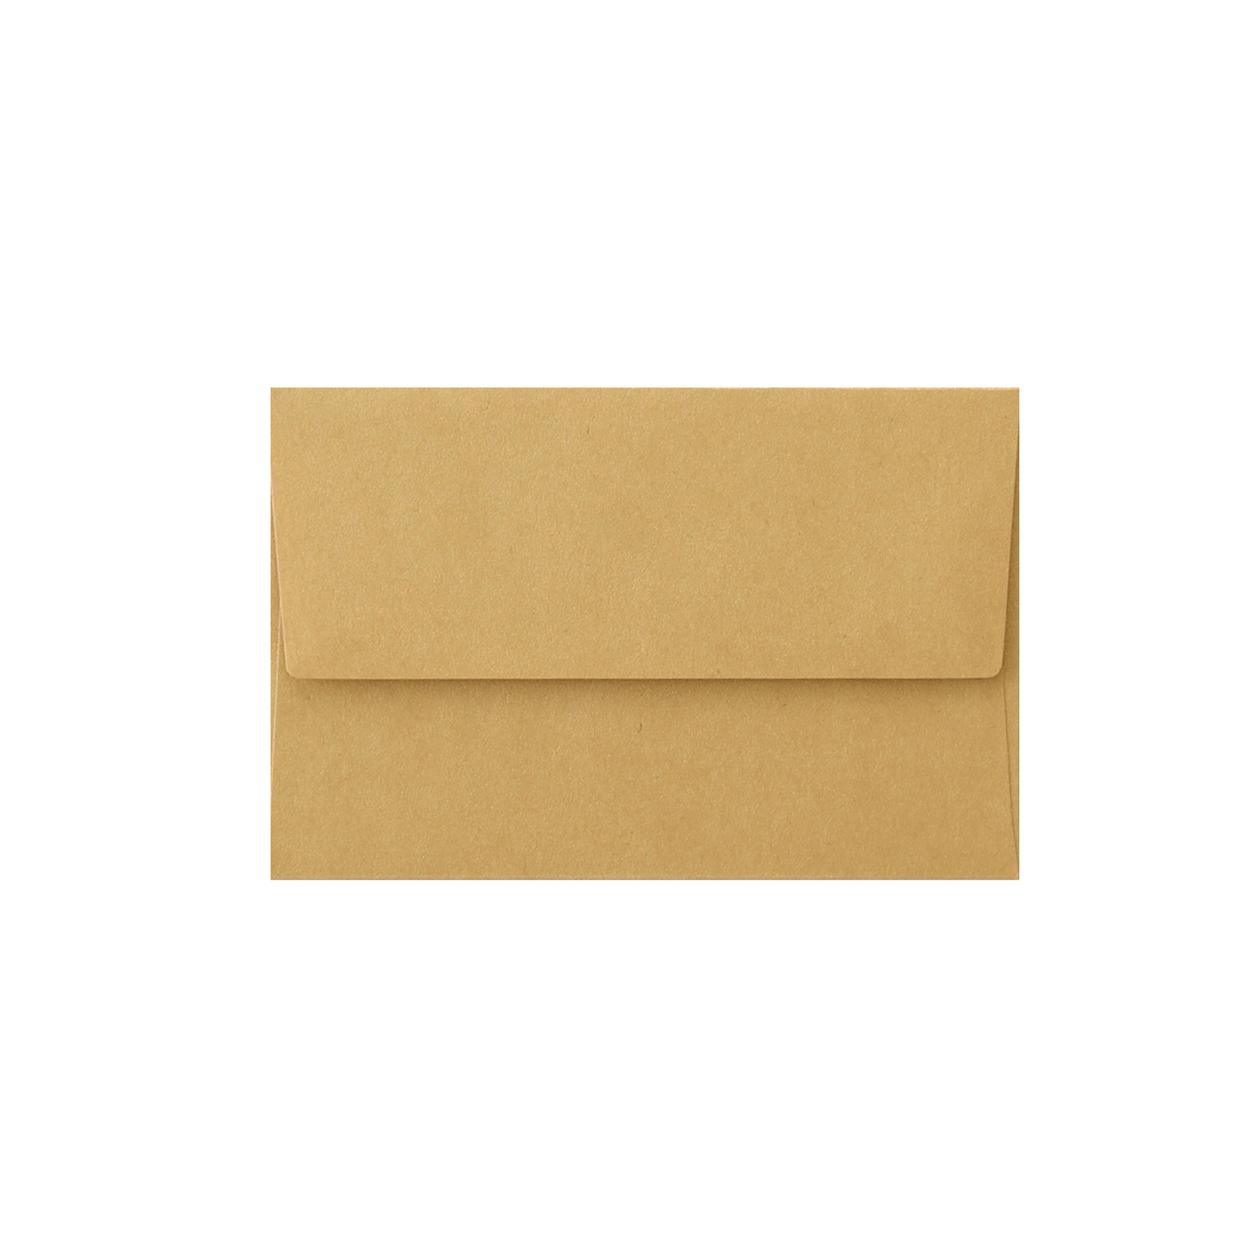 NEカマス封筒 クラシッククラフト ゴールド 107.5g